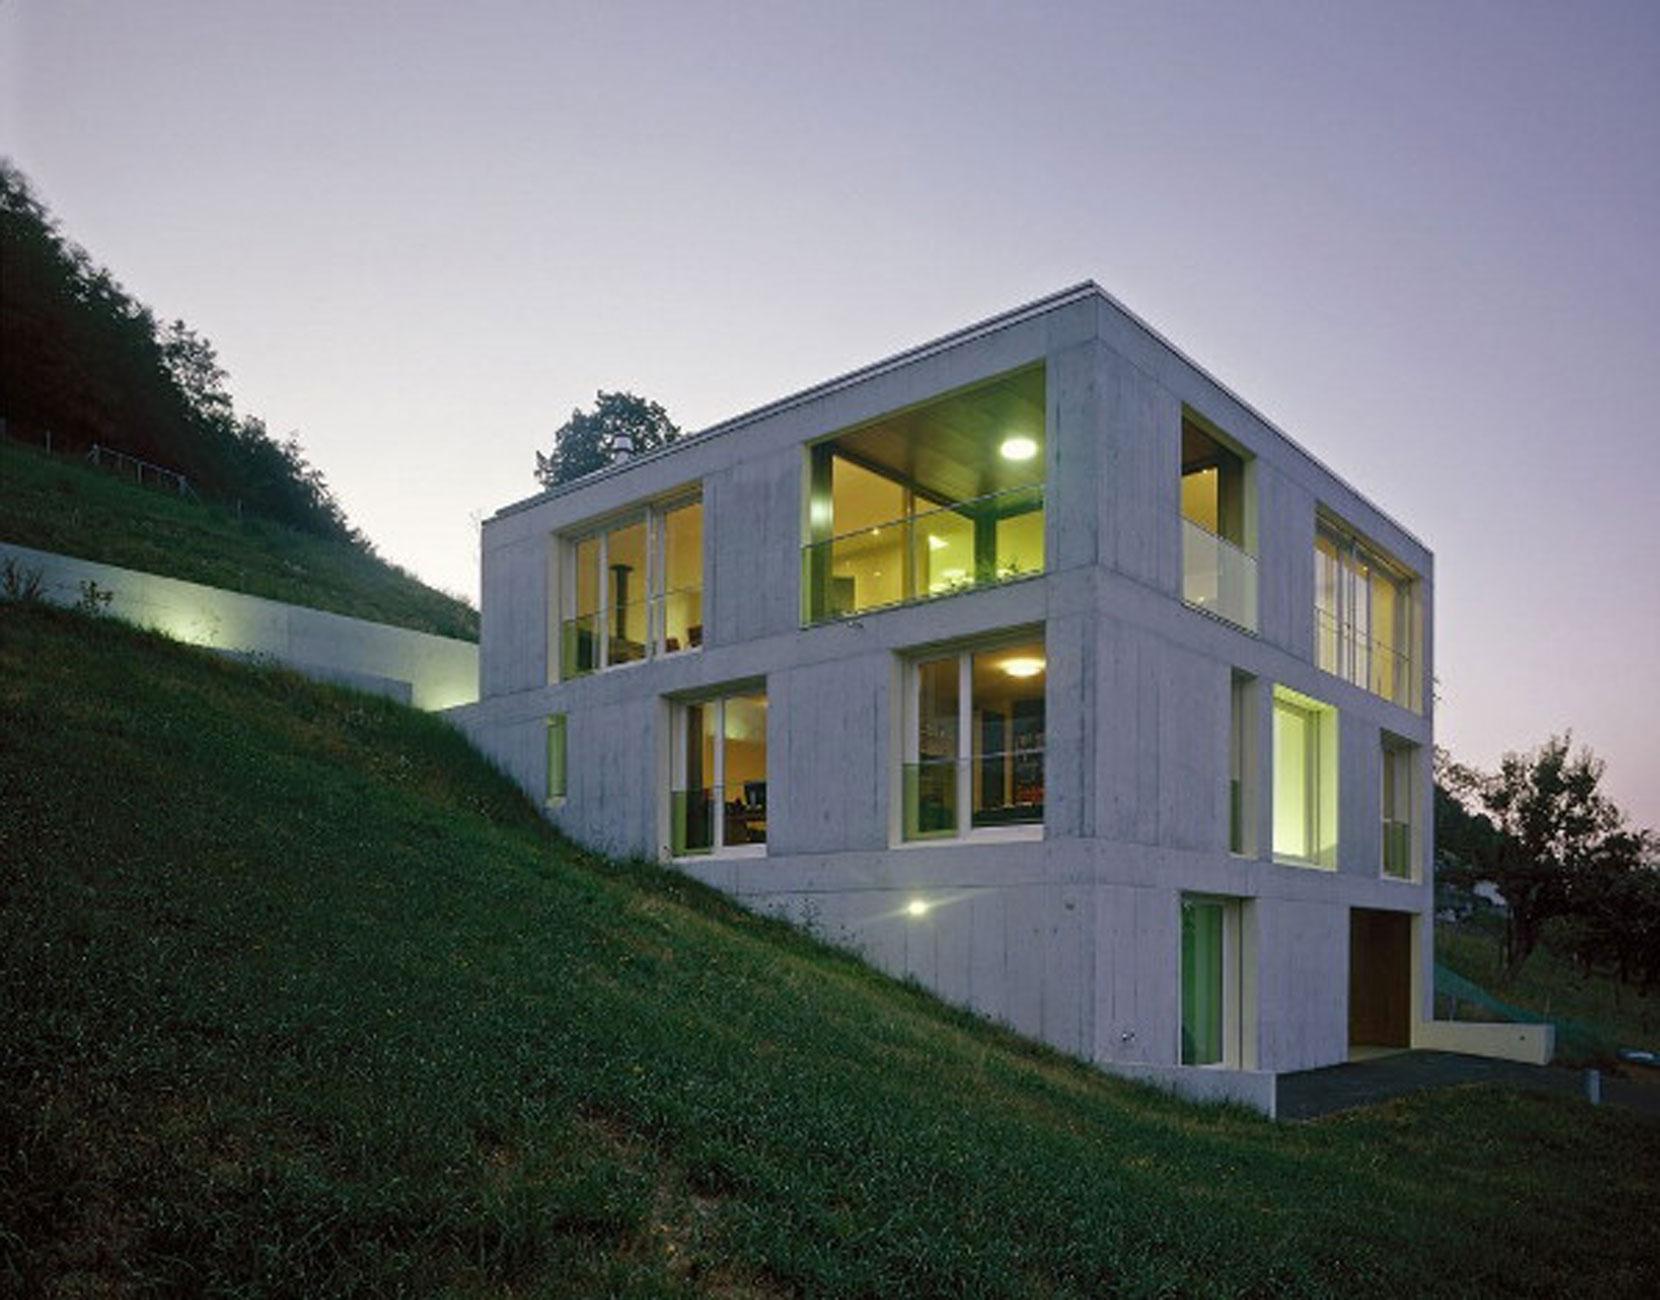 » Contemporary Concrete House Design in Rural Landscape of ...